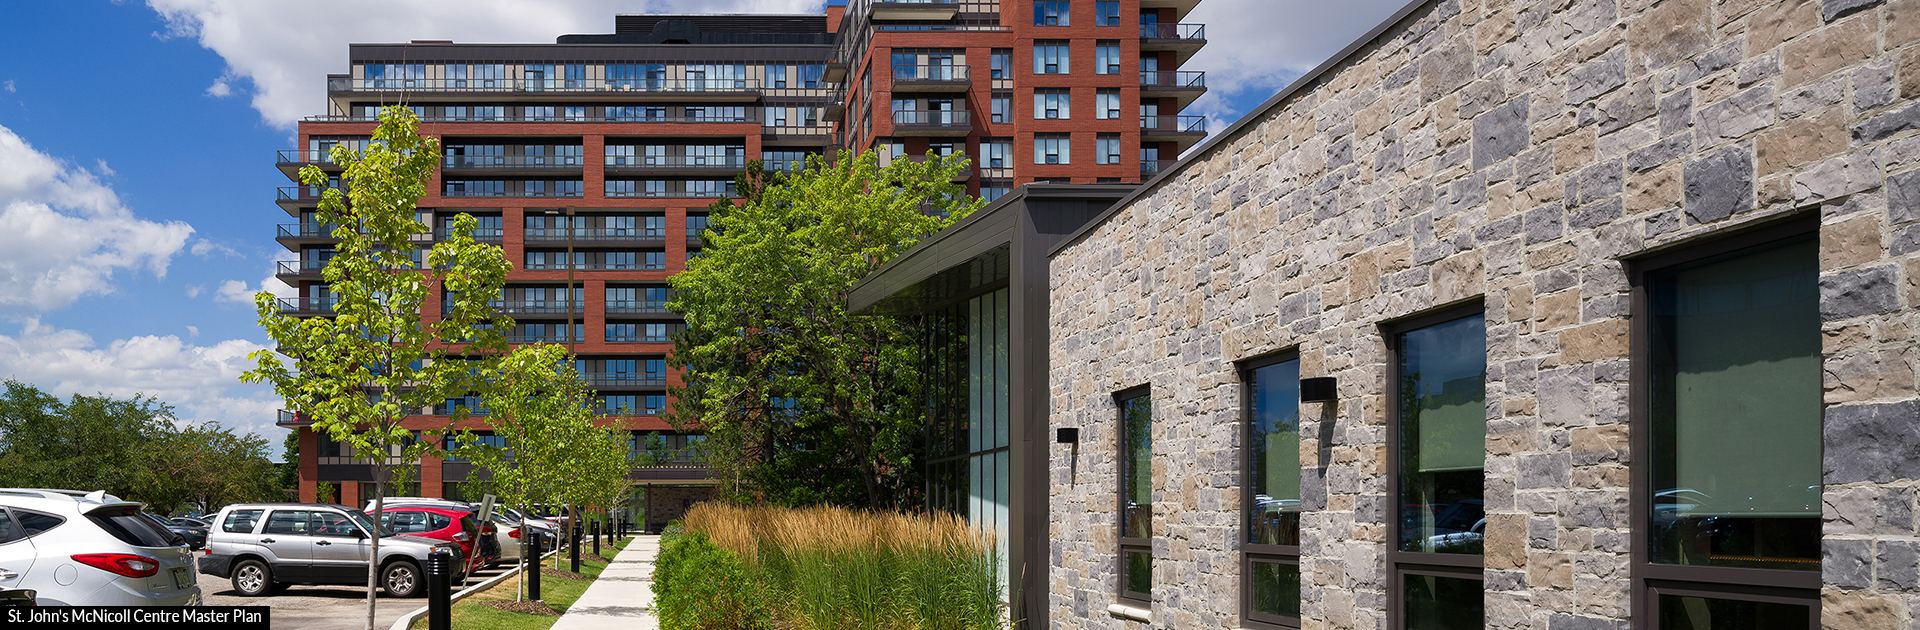 St. John's McNicoll Centre Master Plan